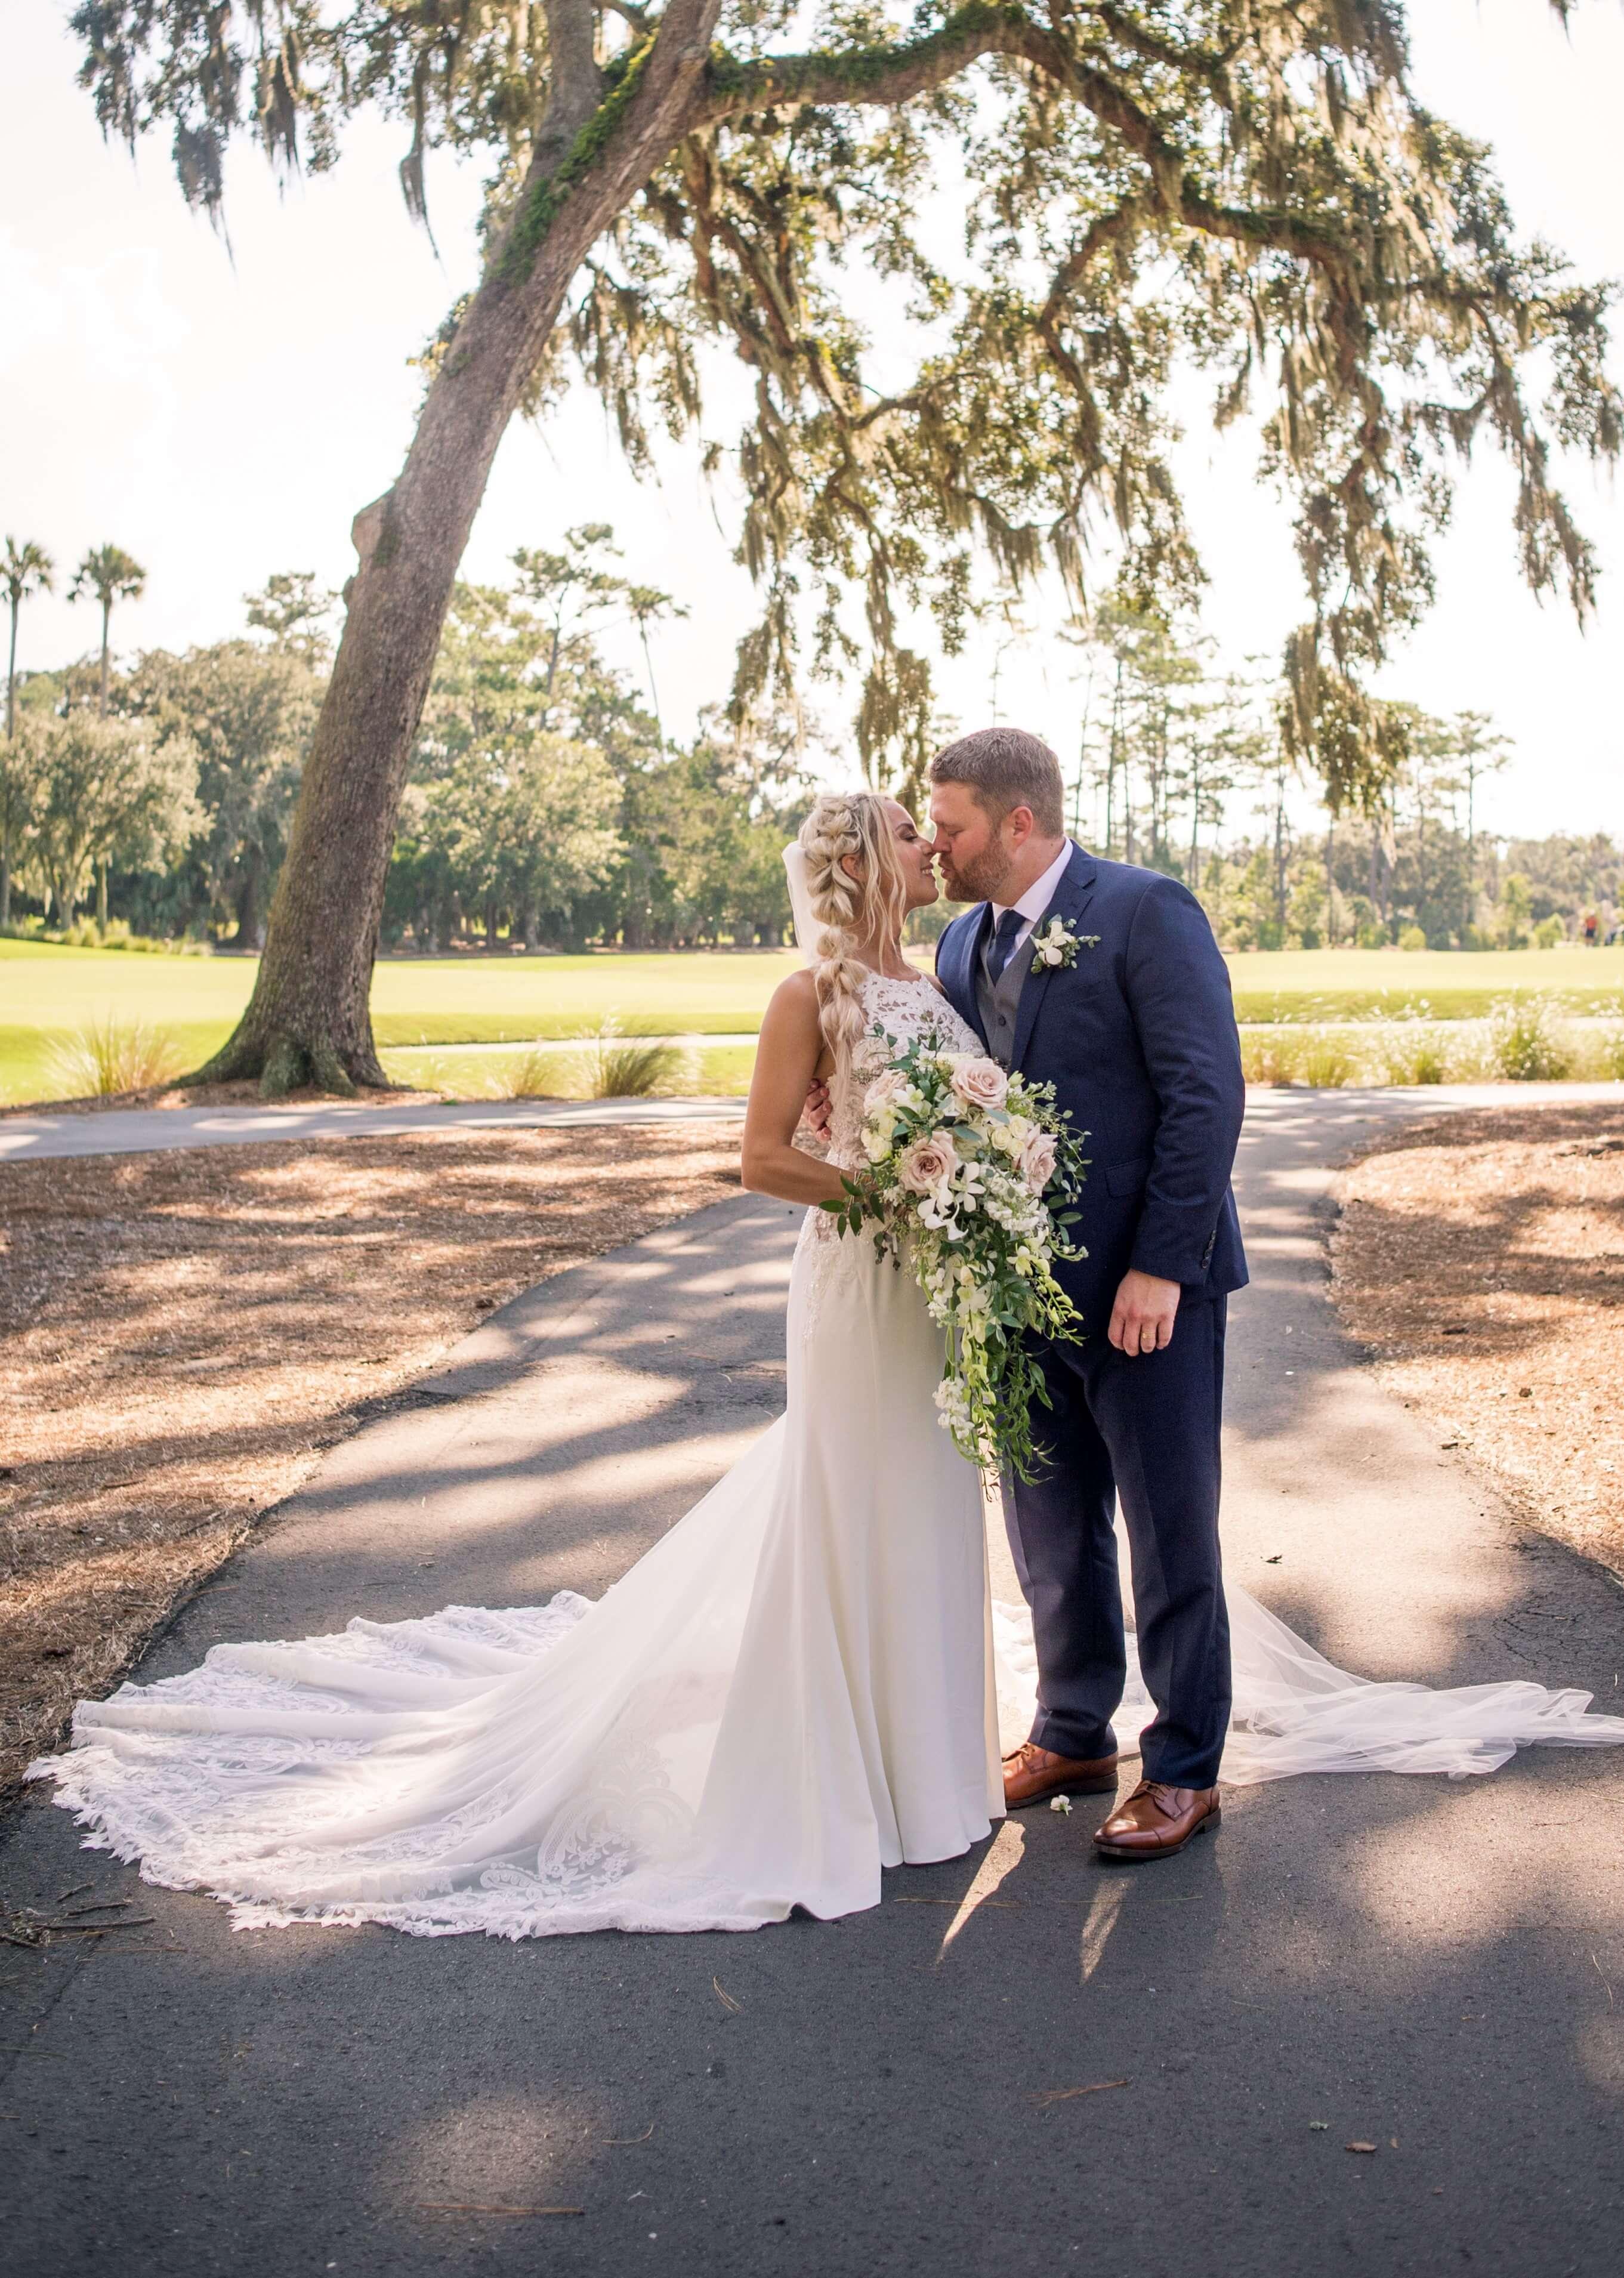 bride and groom wedding dress wedding gown